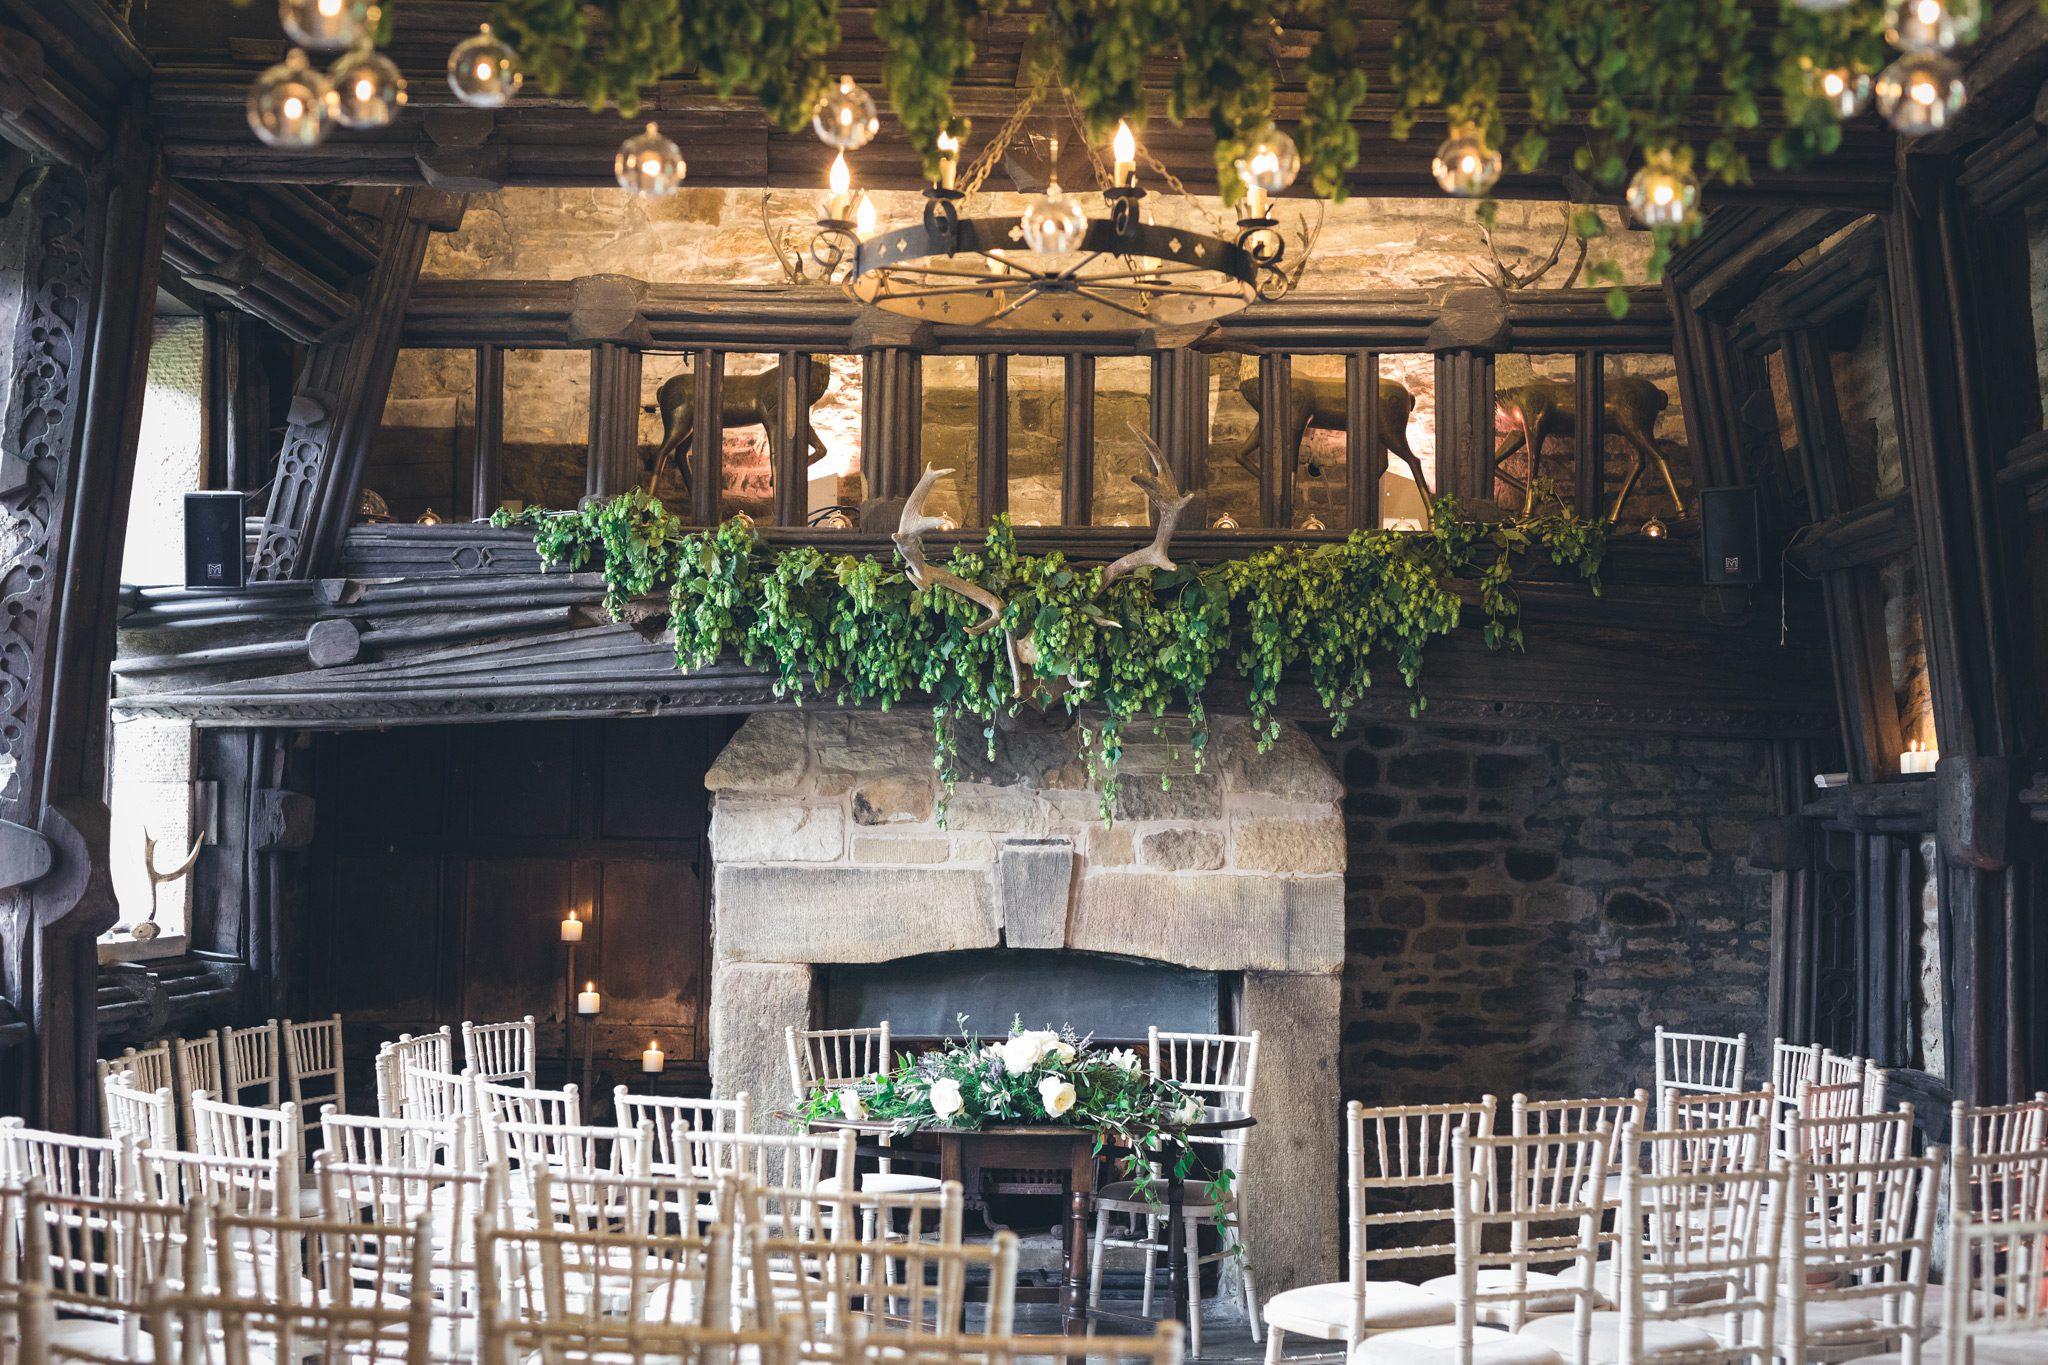 Summer Wedding at Upper House - Ceremony Room